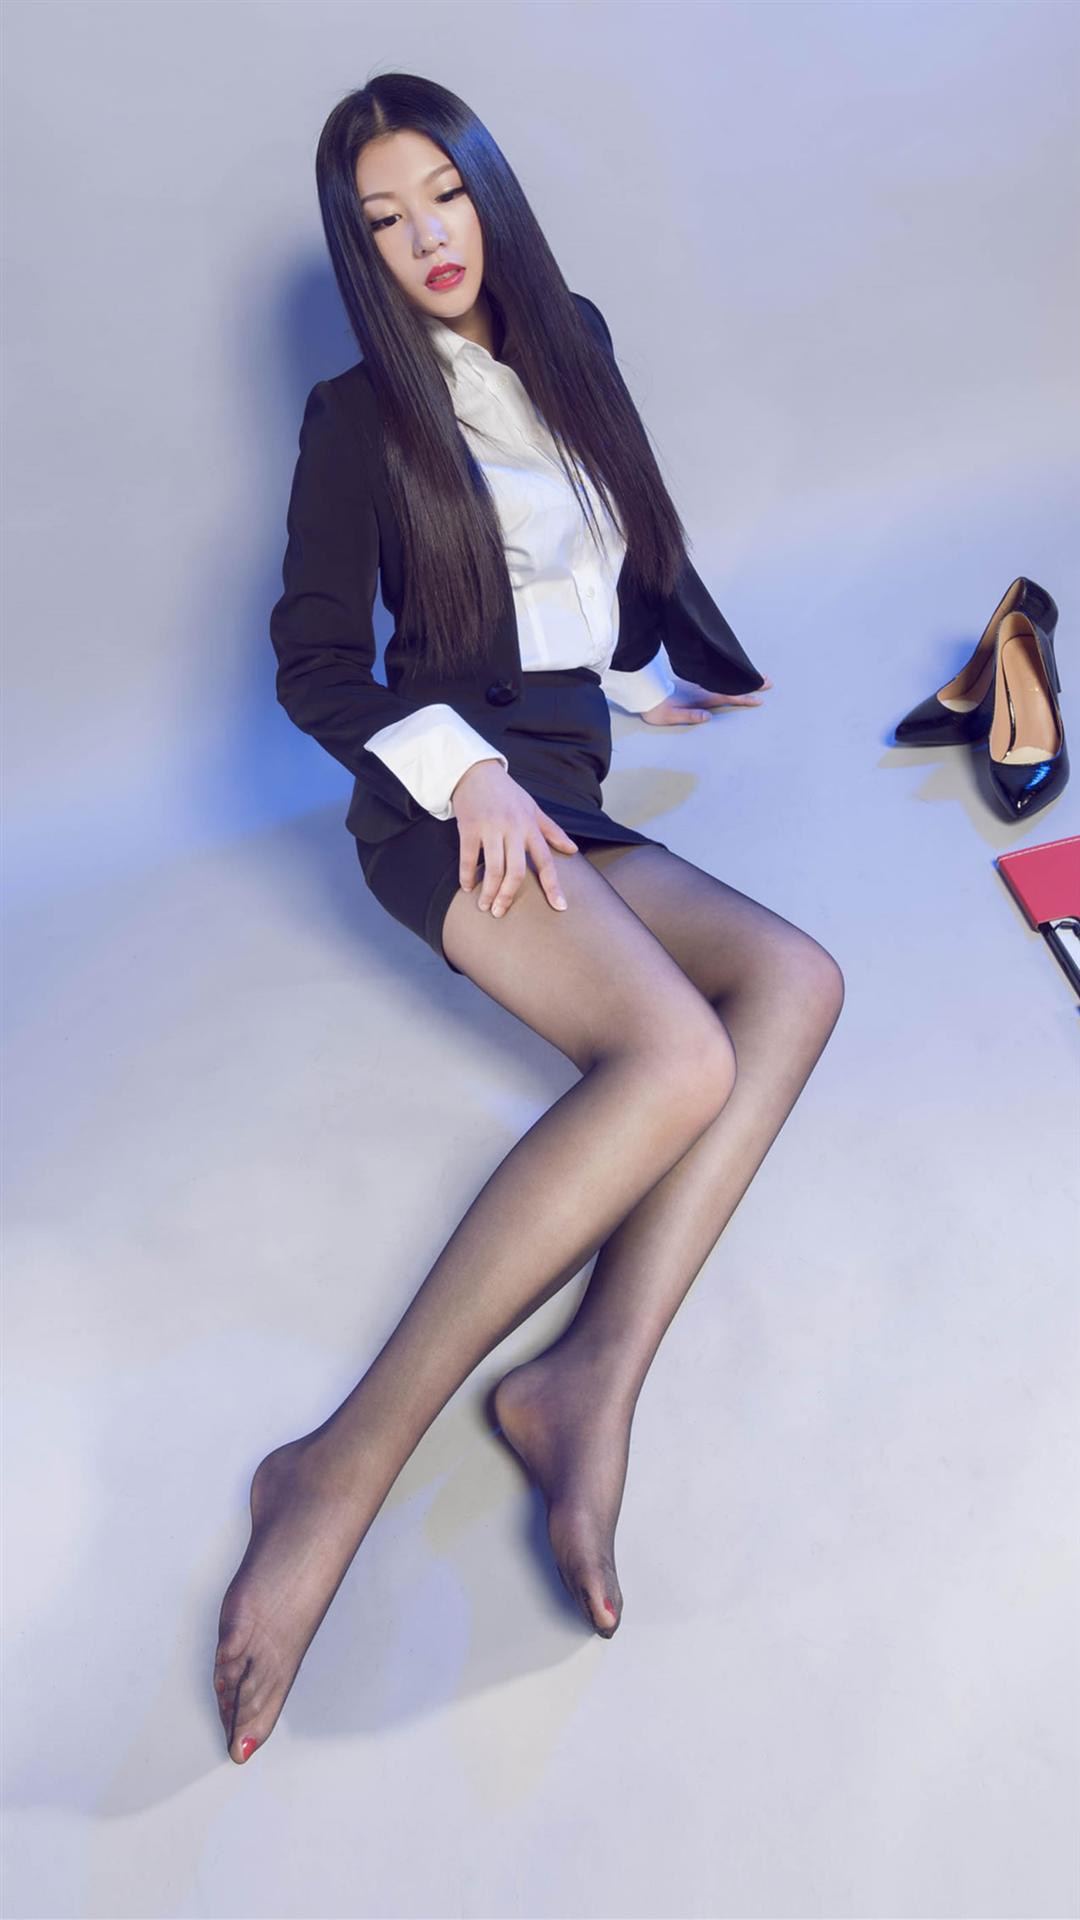 People 1080x1920 Asian women black hair pantyhose high heels office girl brunette skirt